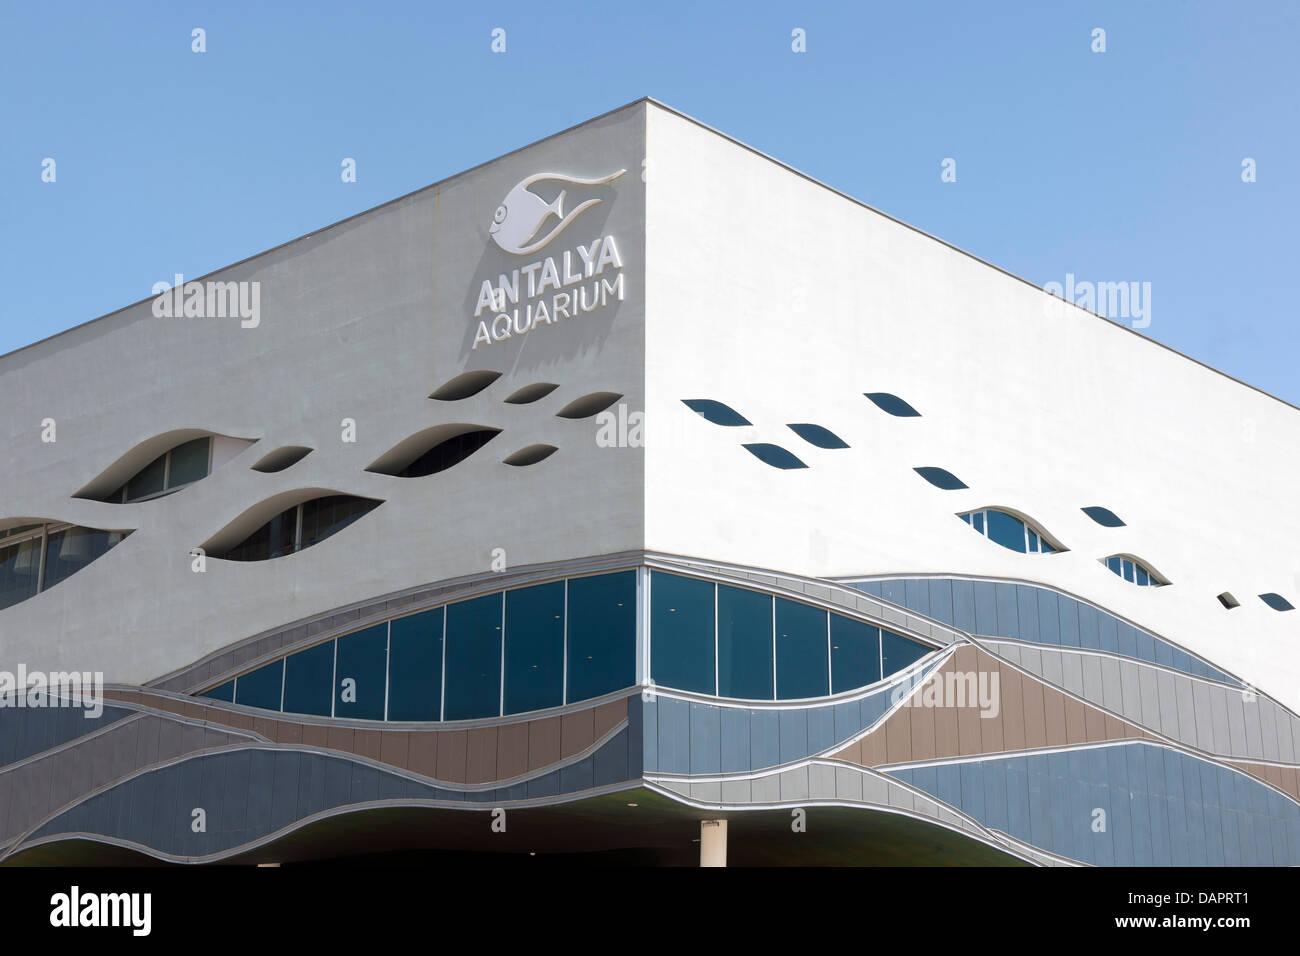 Türkei, Antalya-Stadt, Antalya Aquarium, zweitgrösstes Aquarium Europas - Stock Image